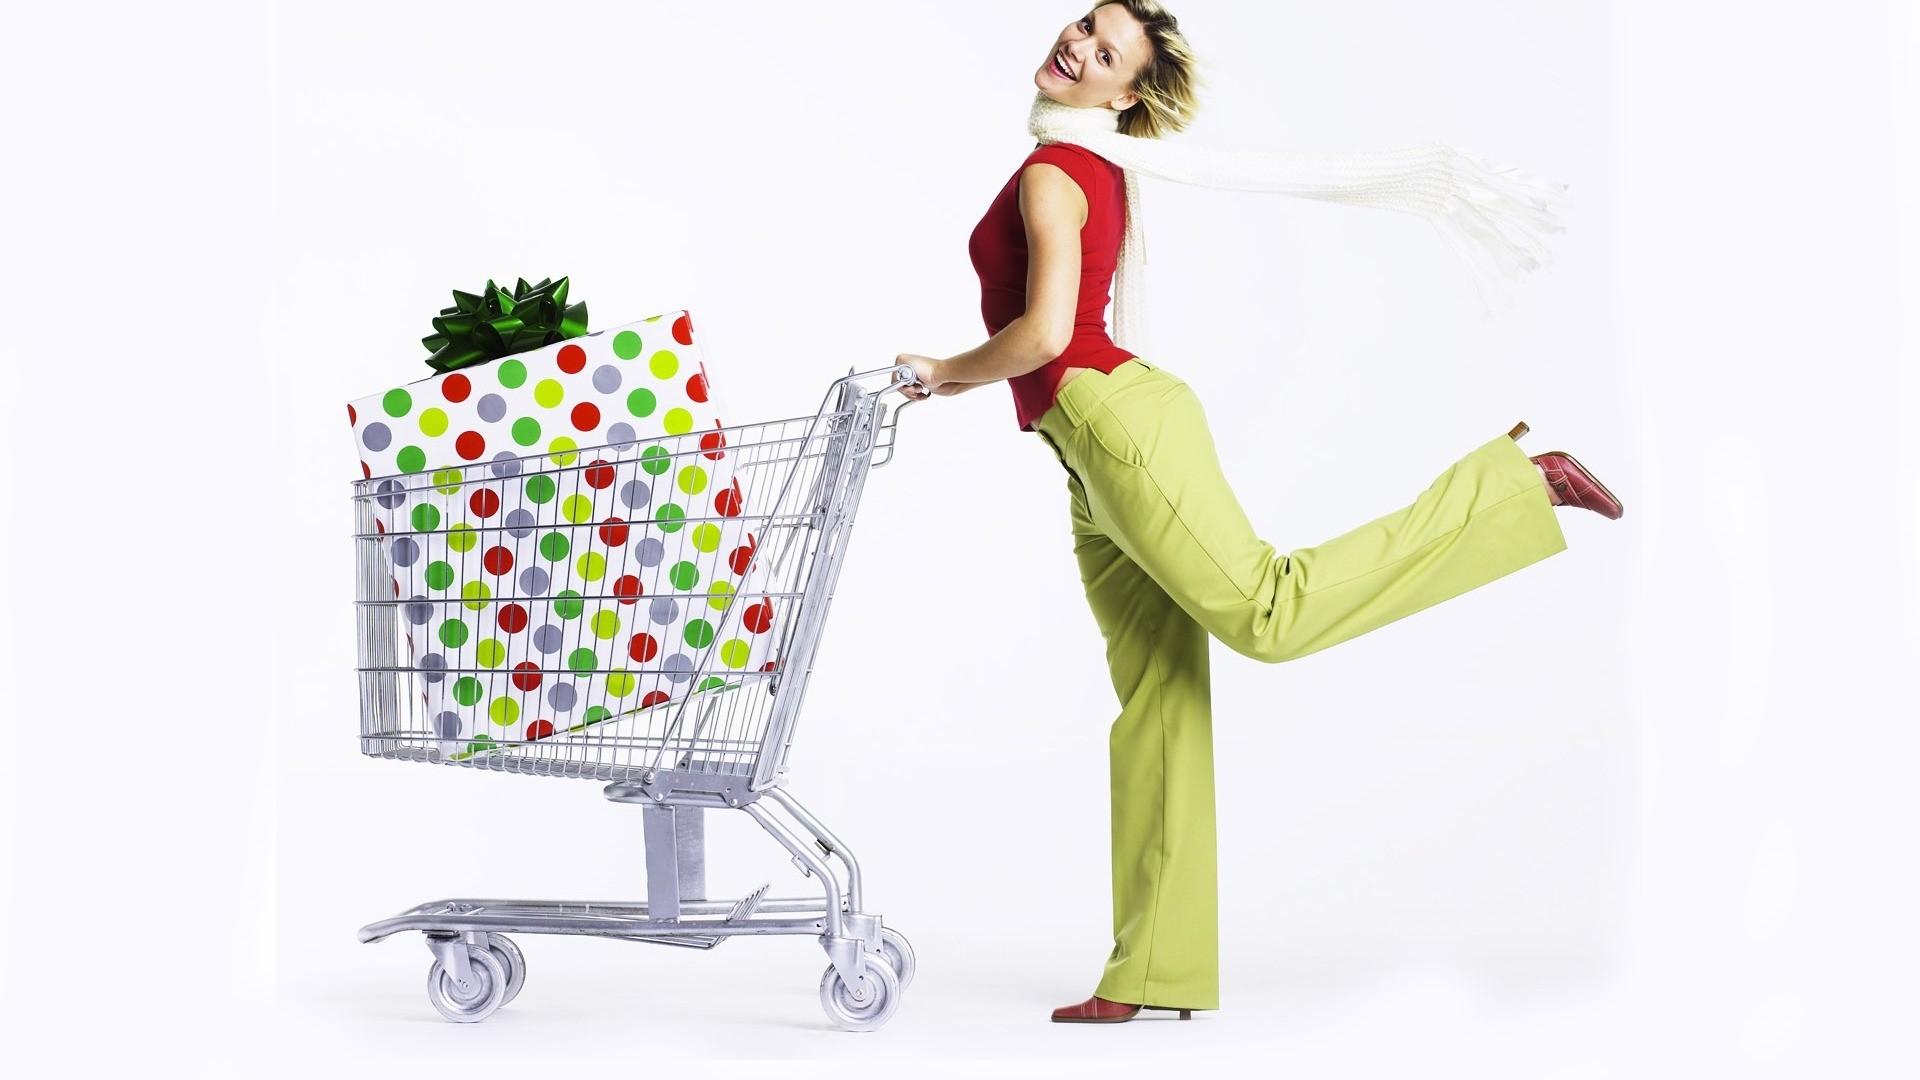 Shopping Free Wallpaper